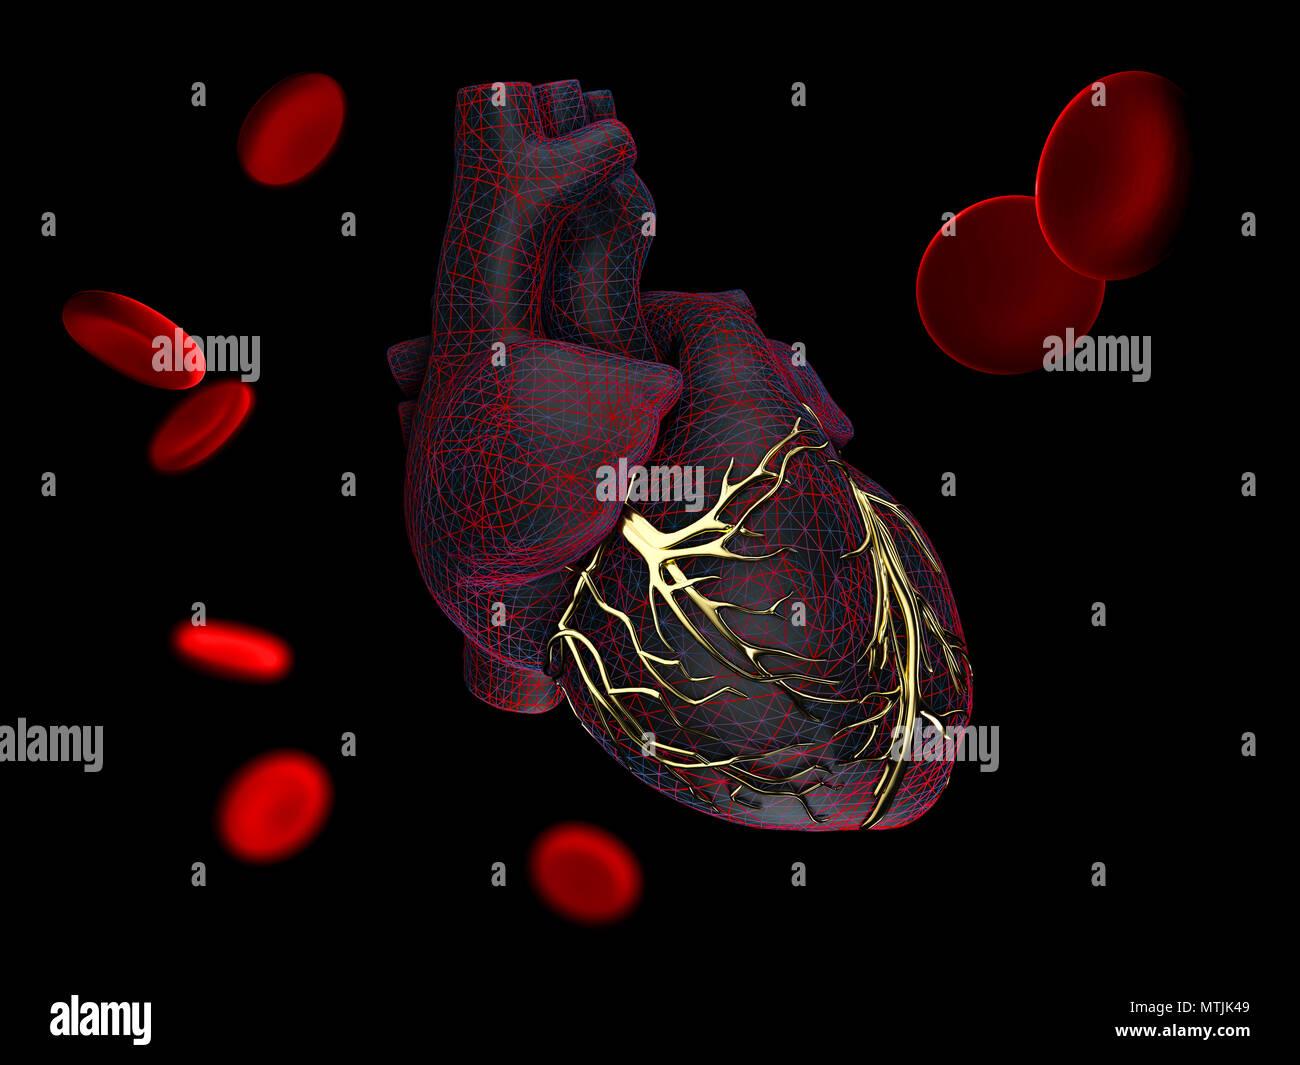 Cerebral Veins Stock Photos & Cerebral Veins Stock Images - Alamy